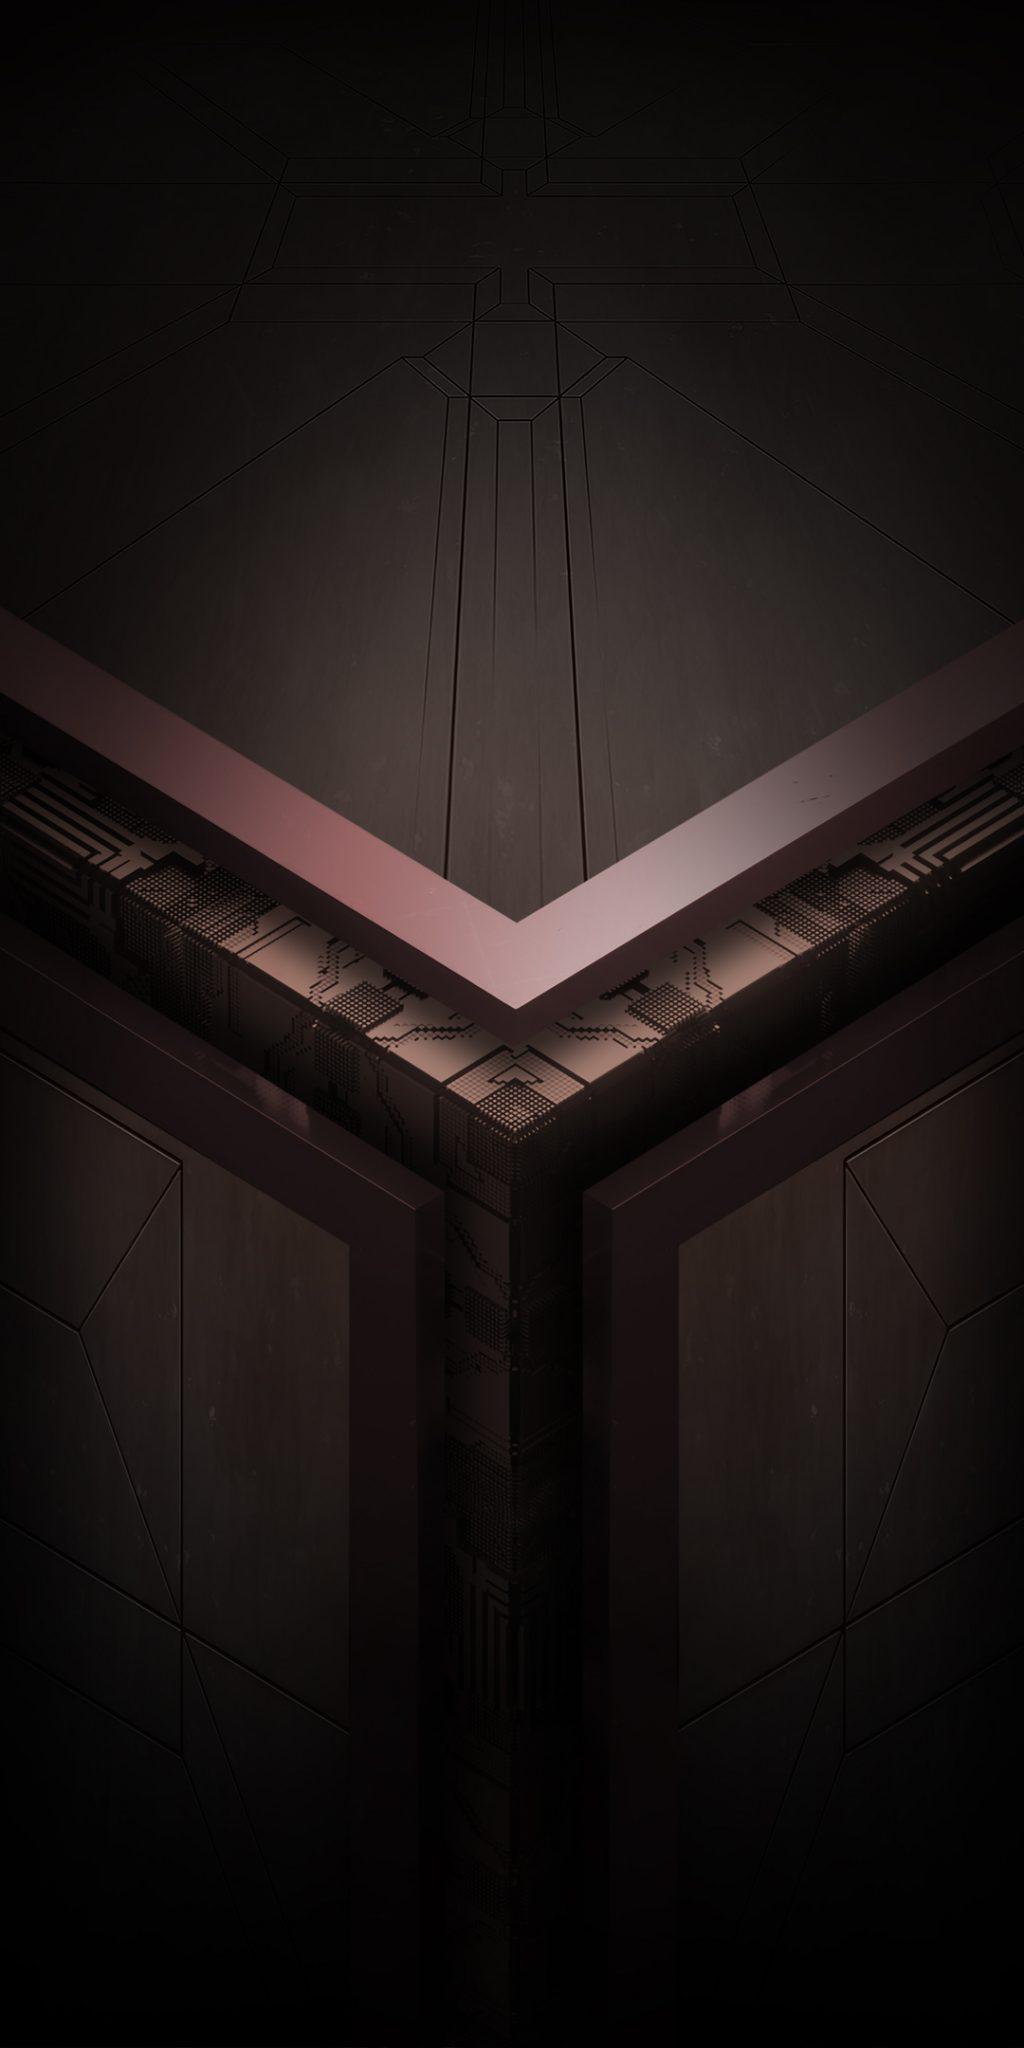 asus-rog-default-wallpaper-2-TechFoogle